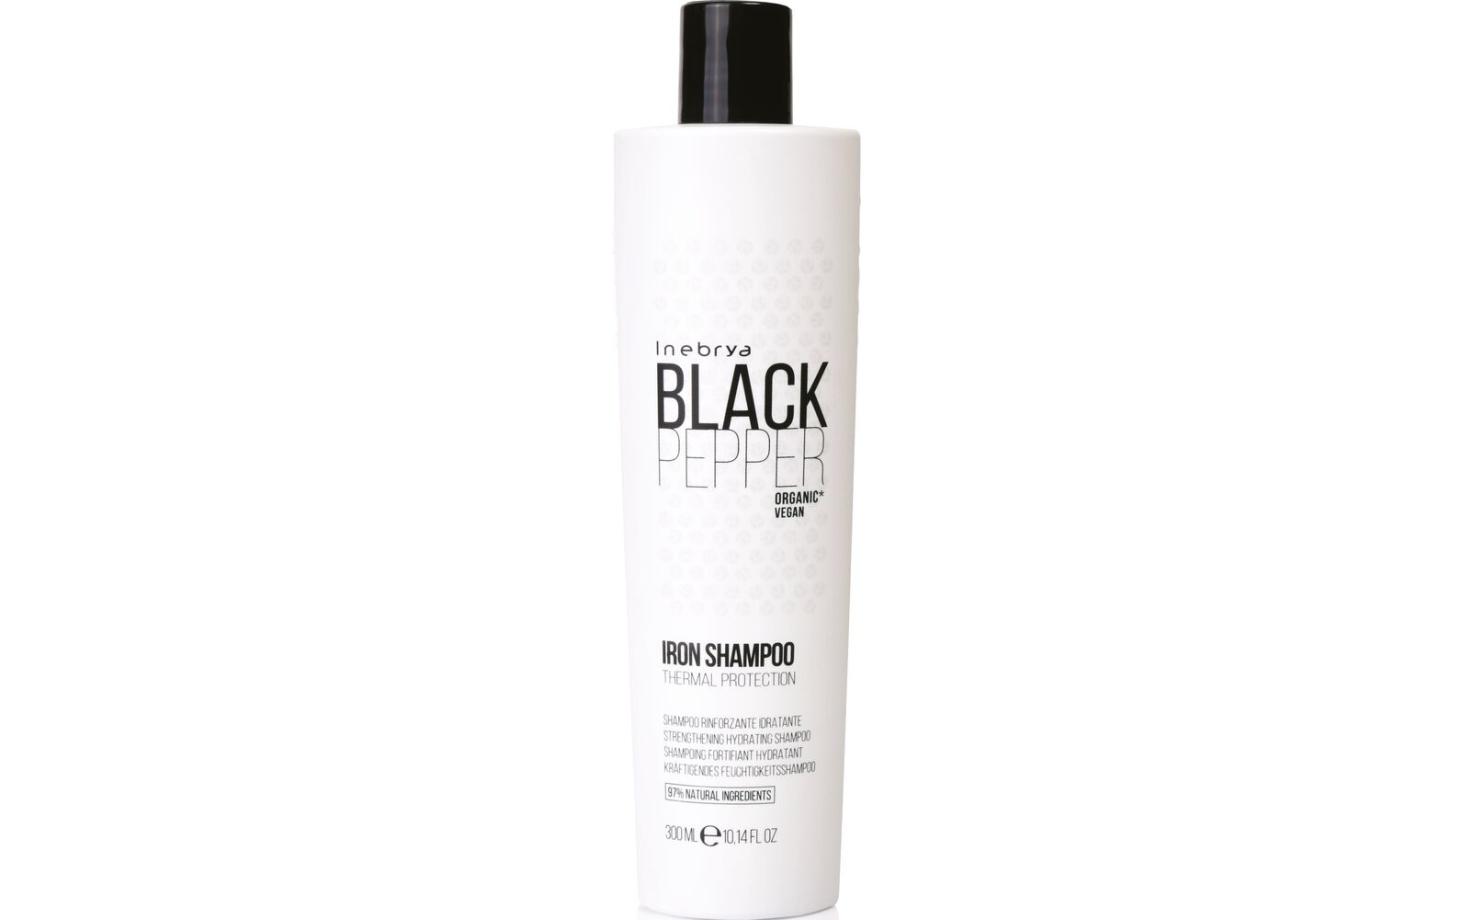 Black Pepper Iron Shampoo